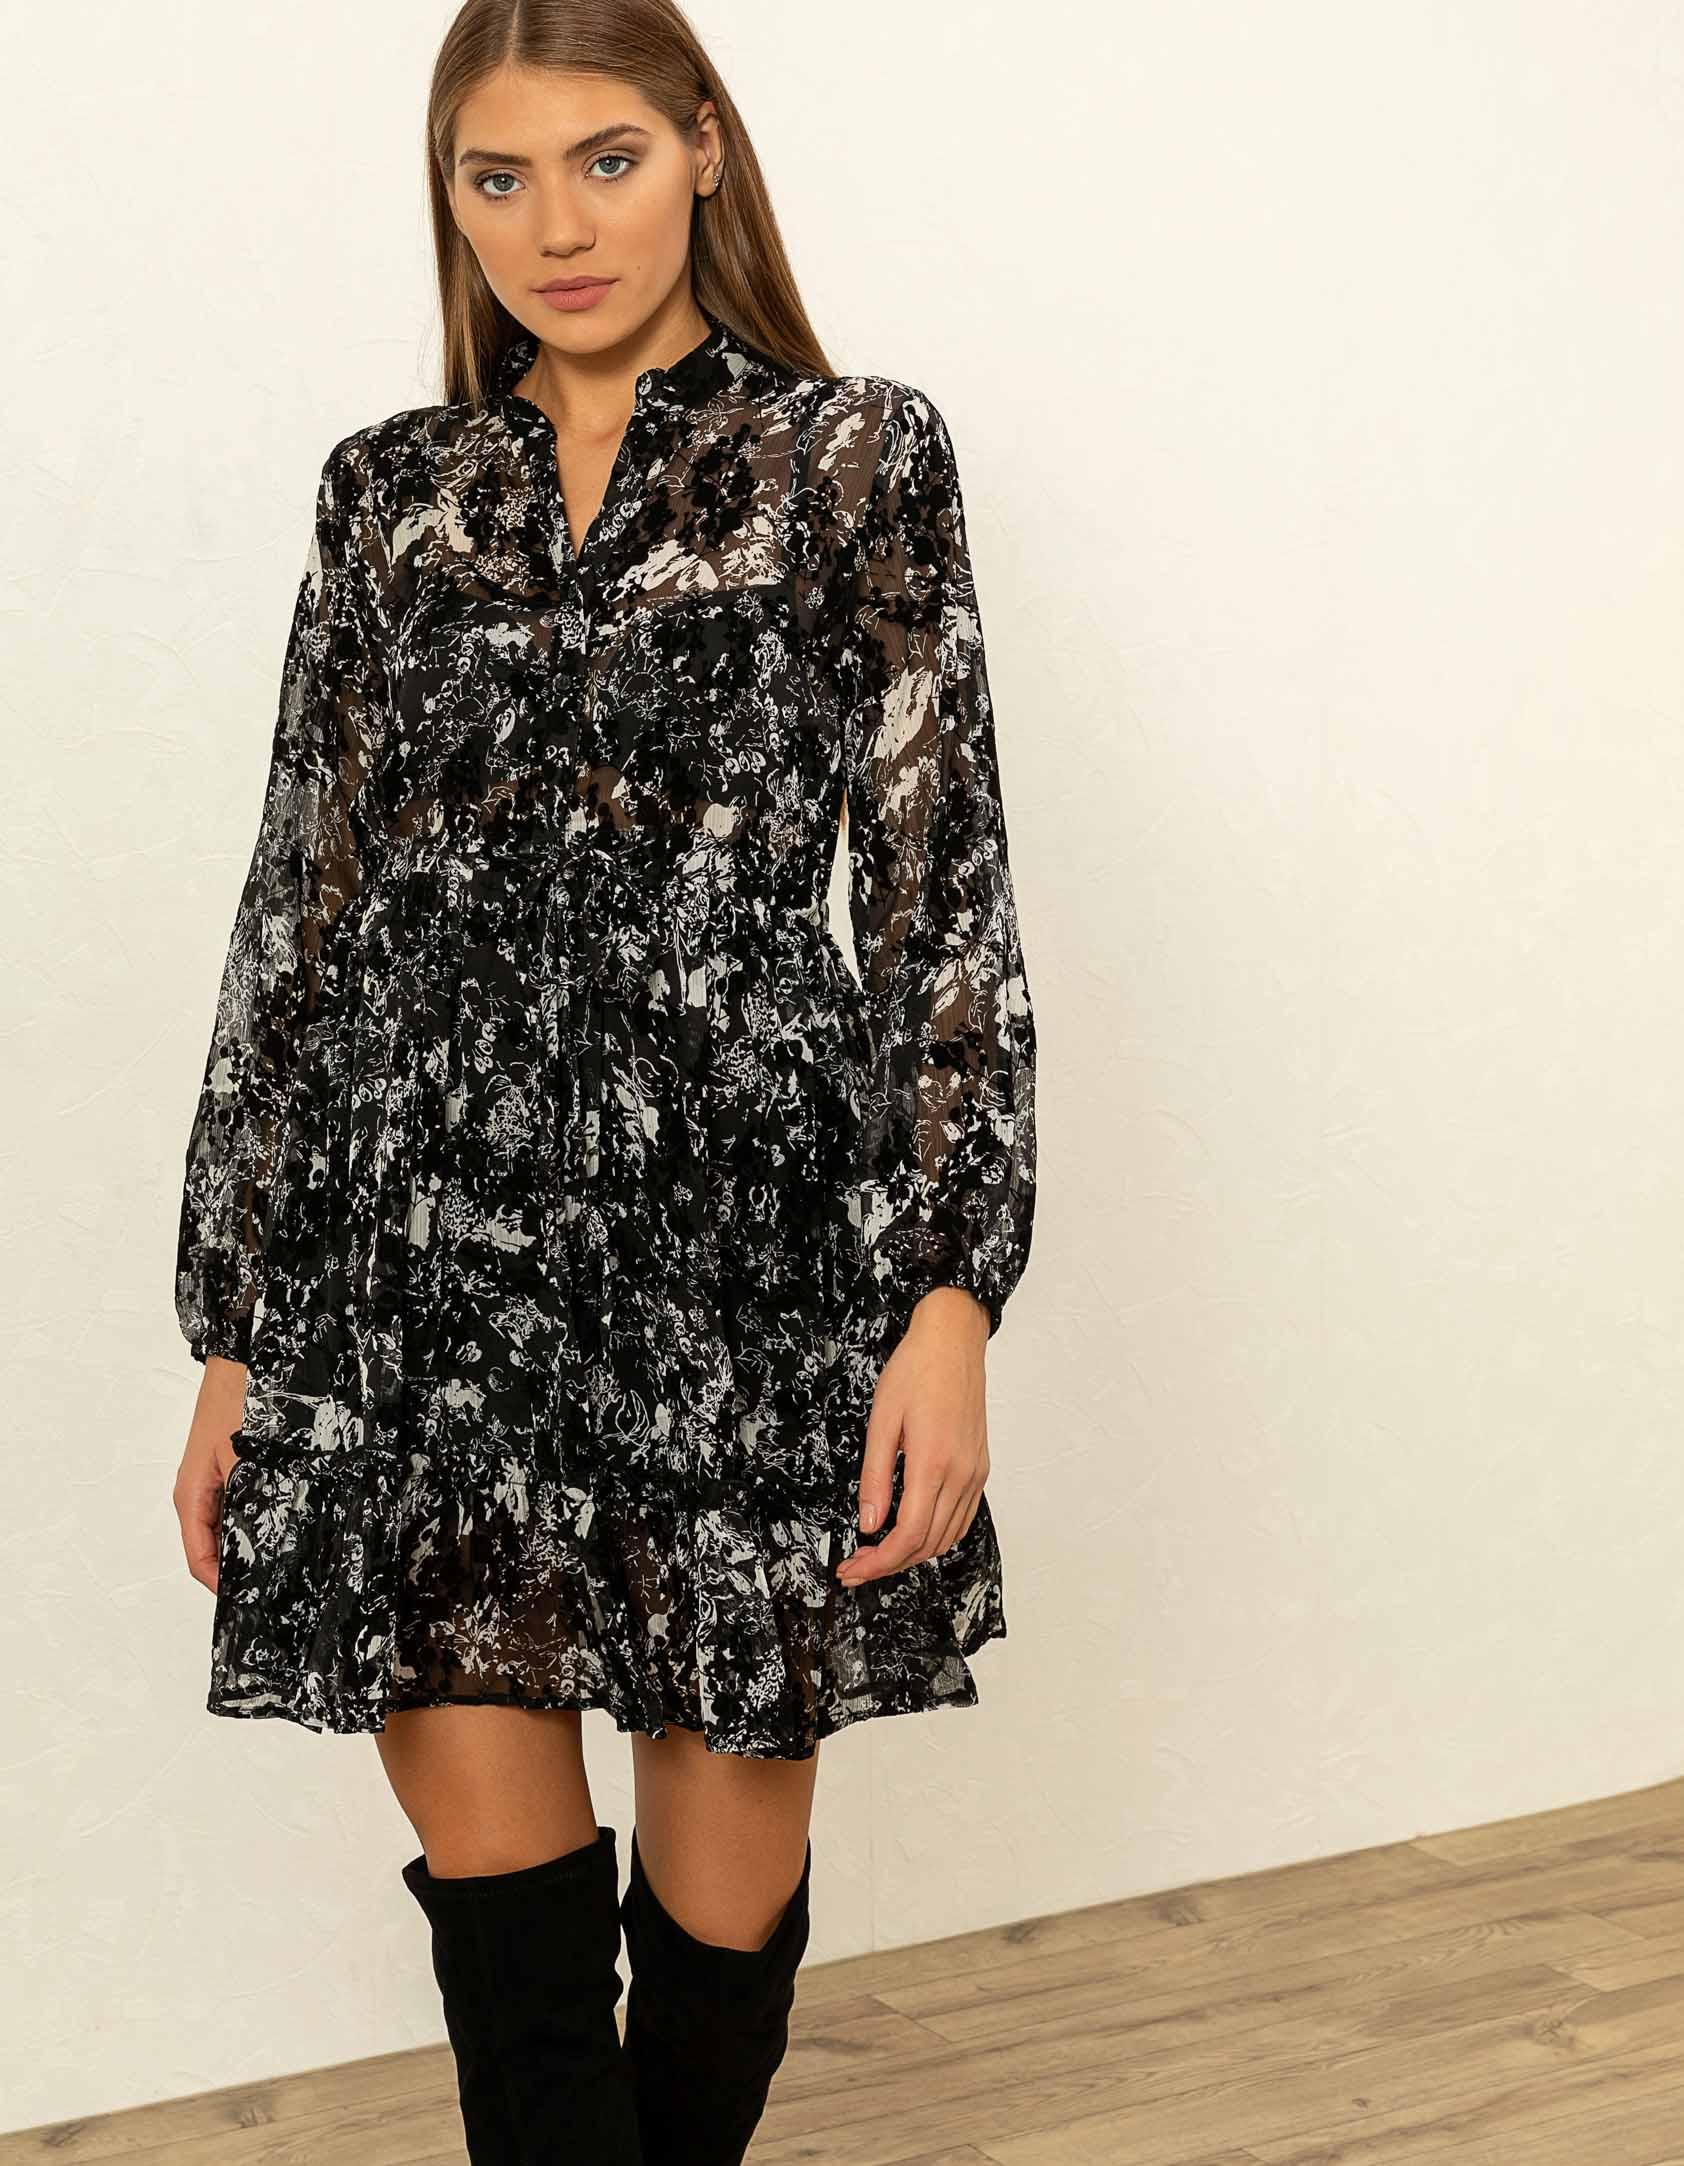 Mini φόρεμα με βελούδινες λεπτομέρειες - Μαύρο